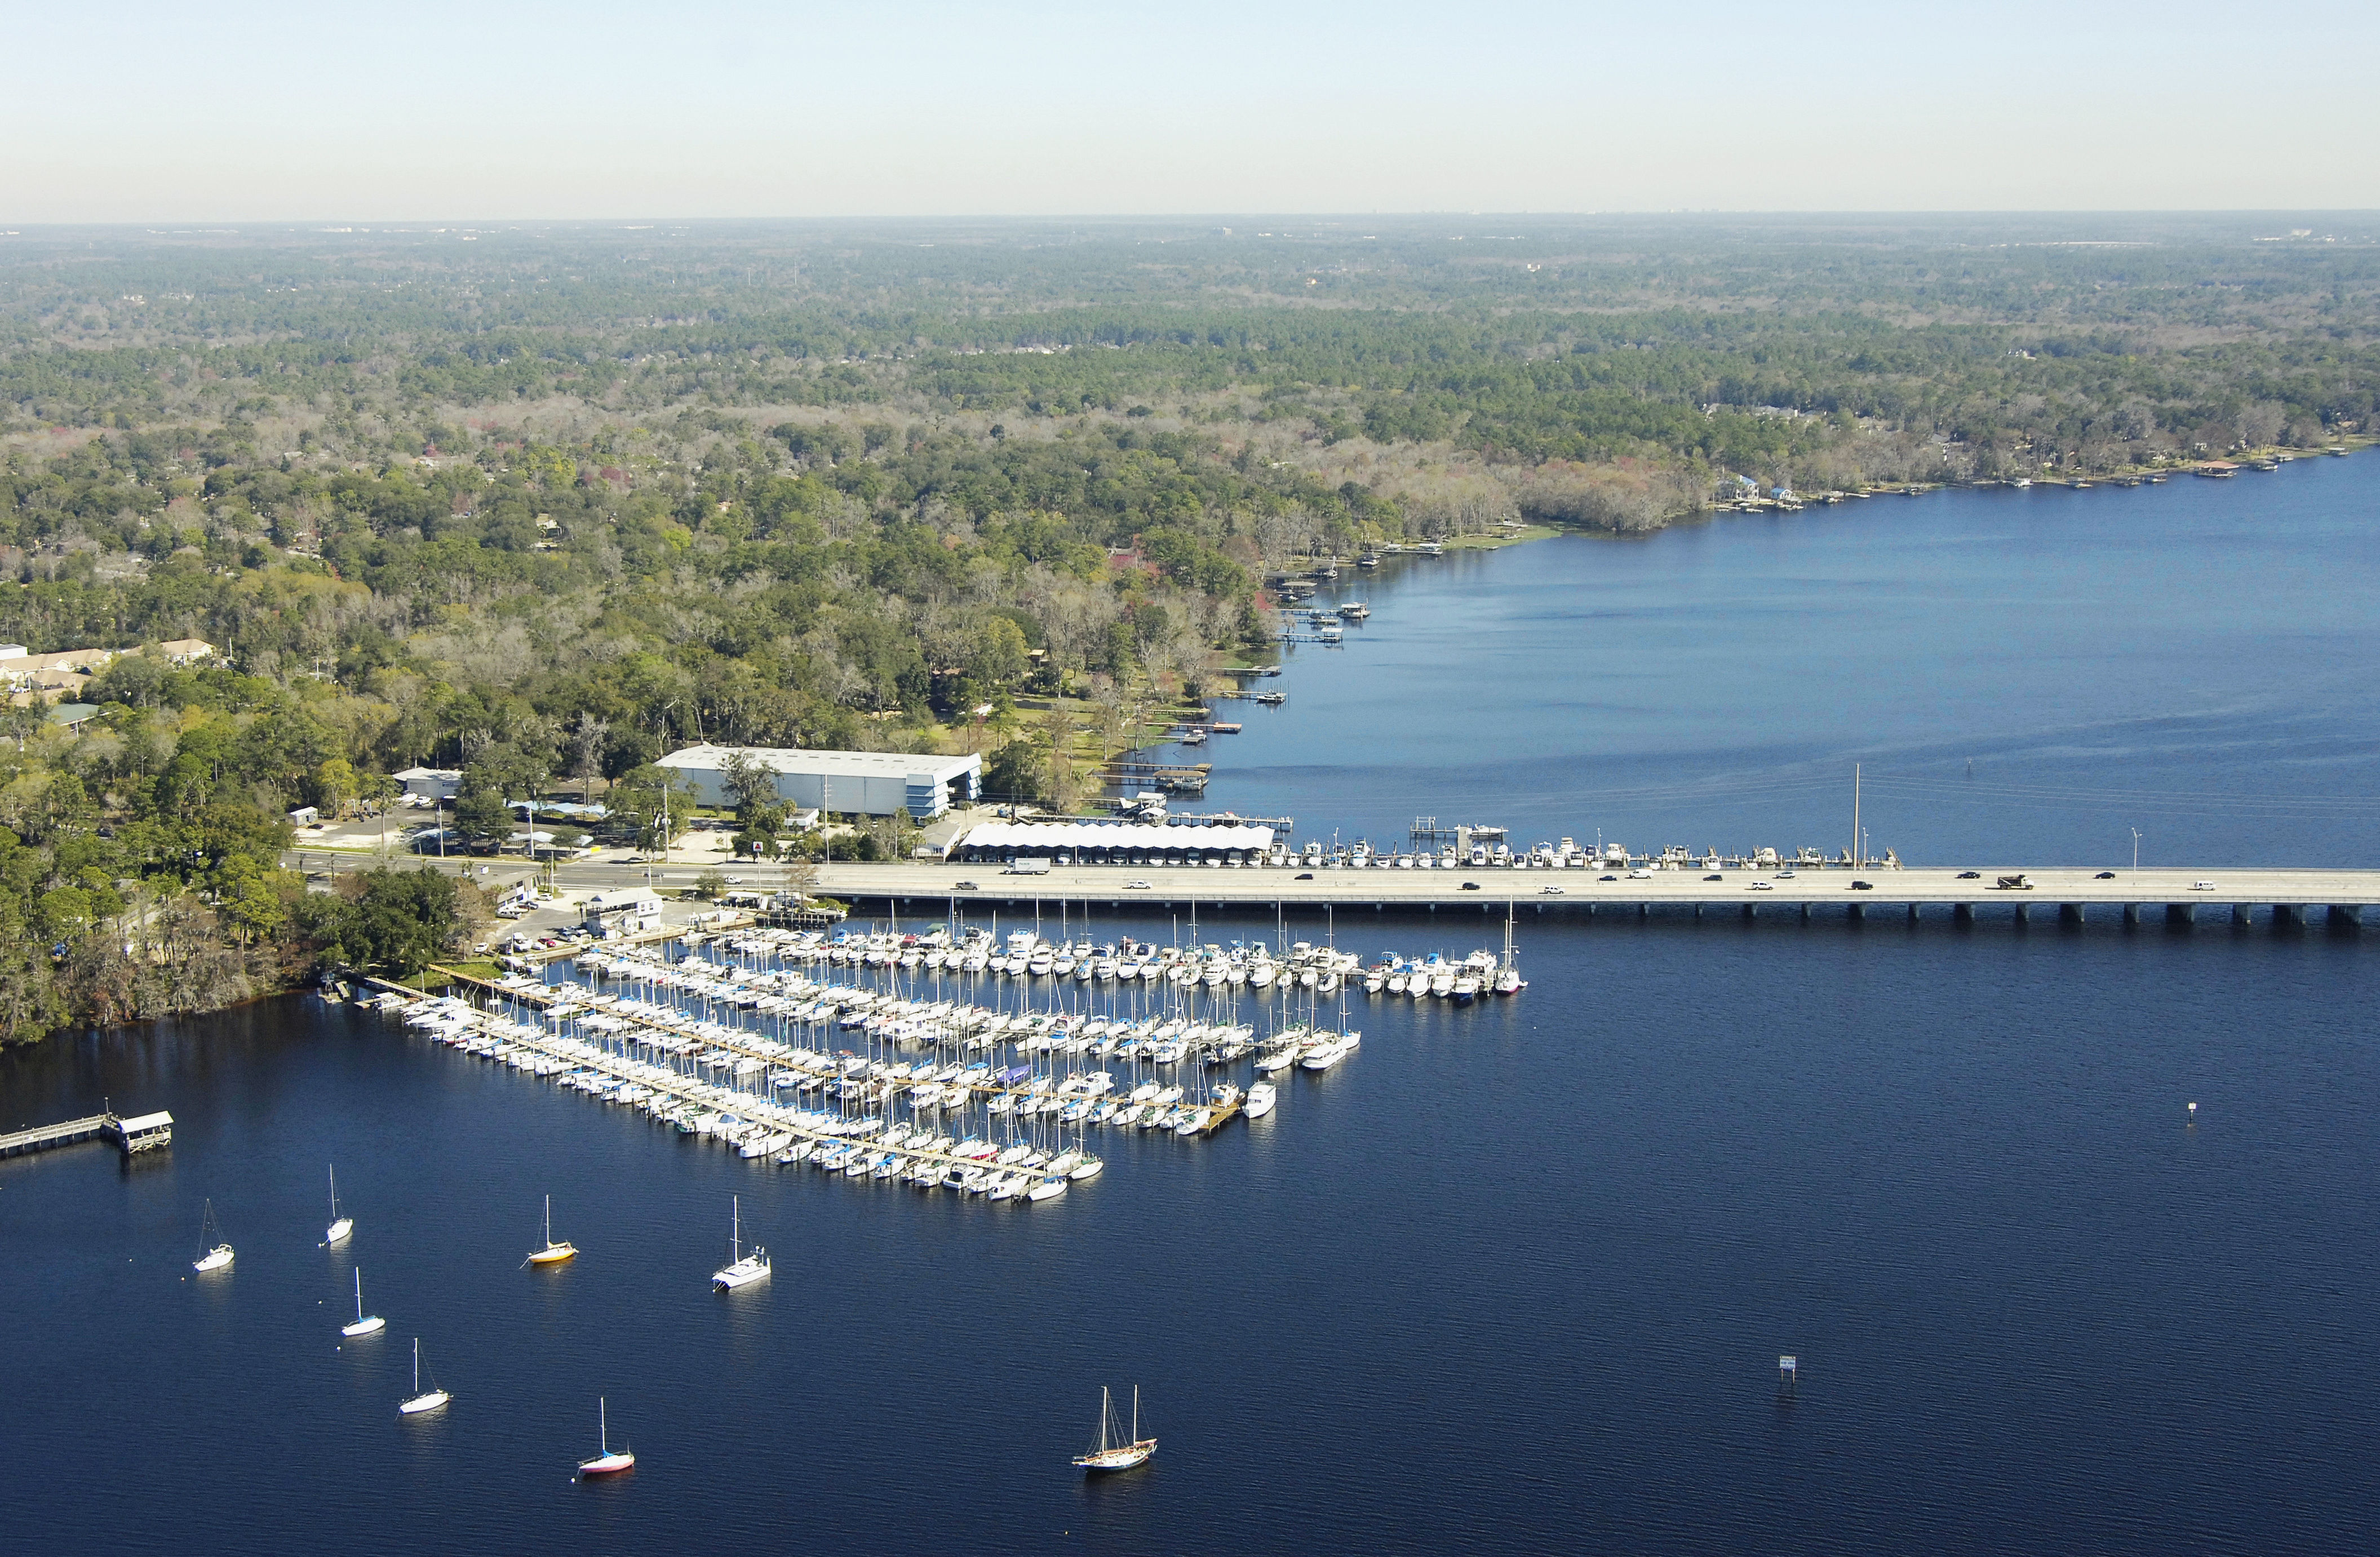 The Marina At Julington Creek In Jacksonville Fl United